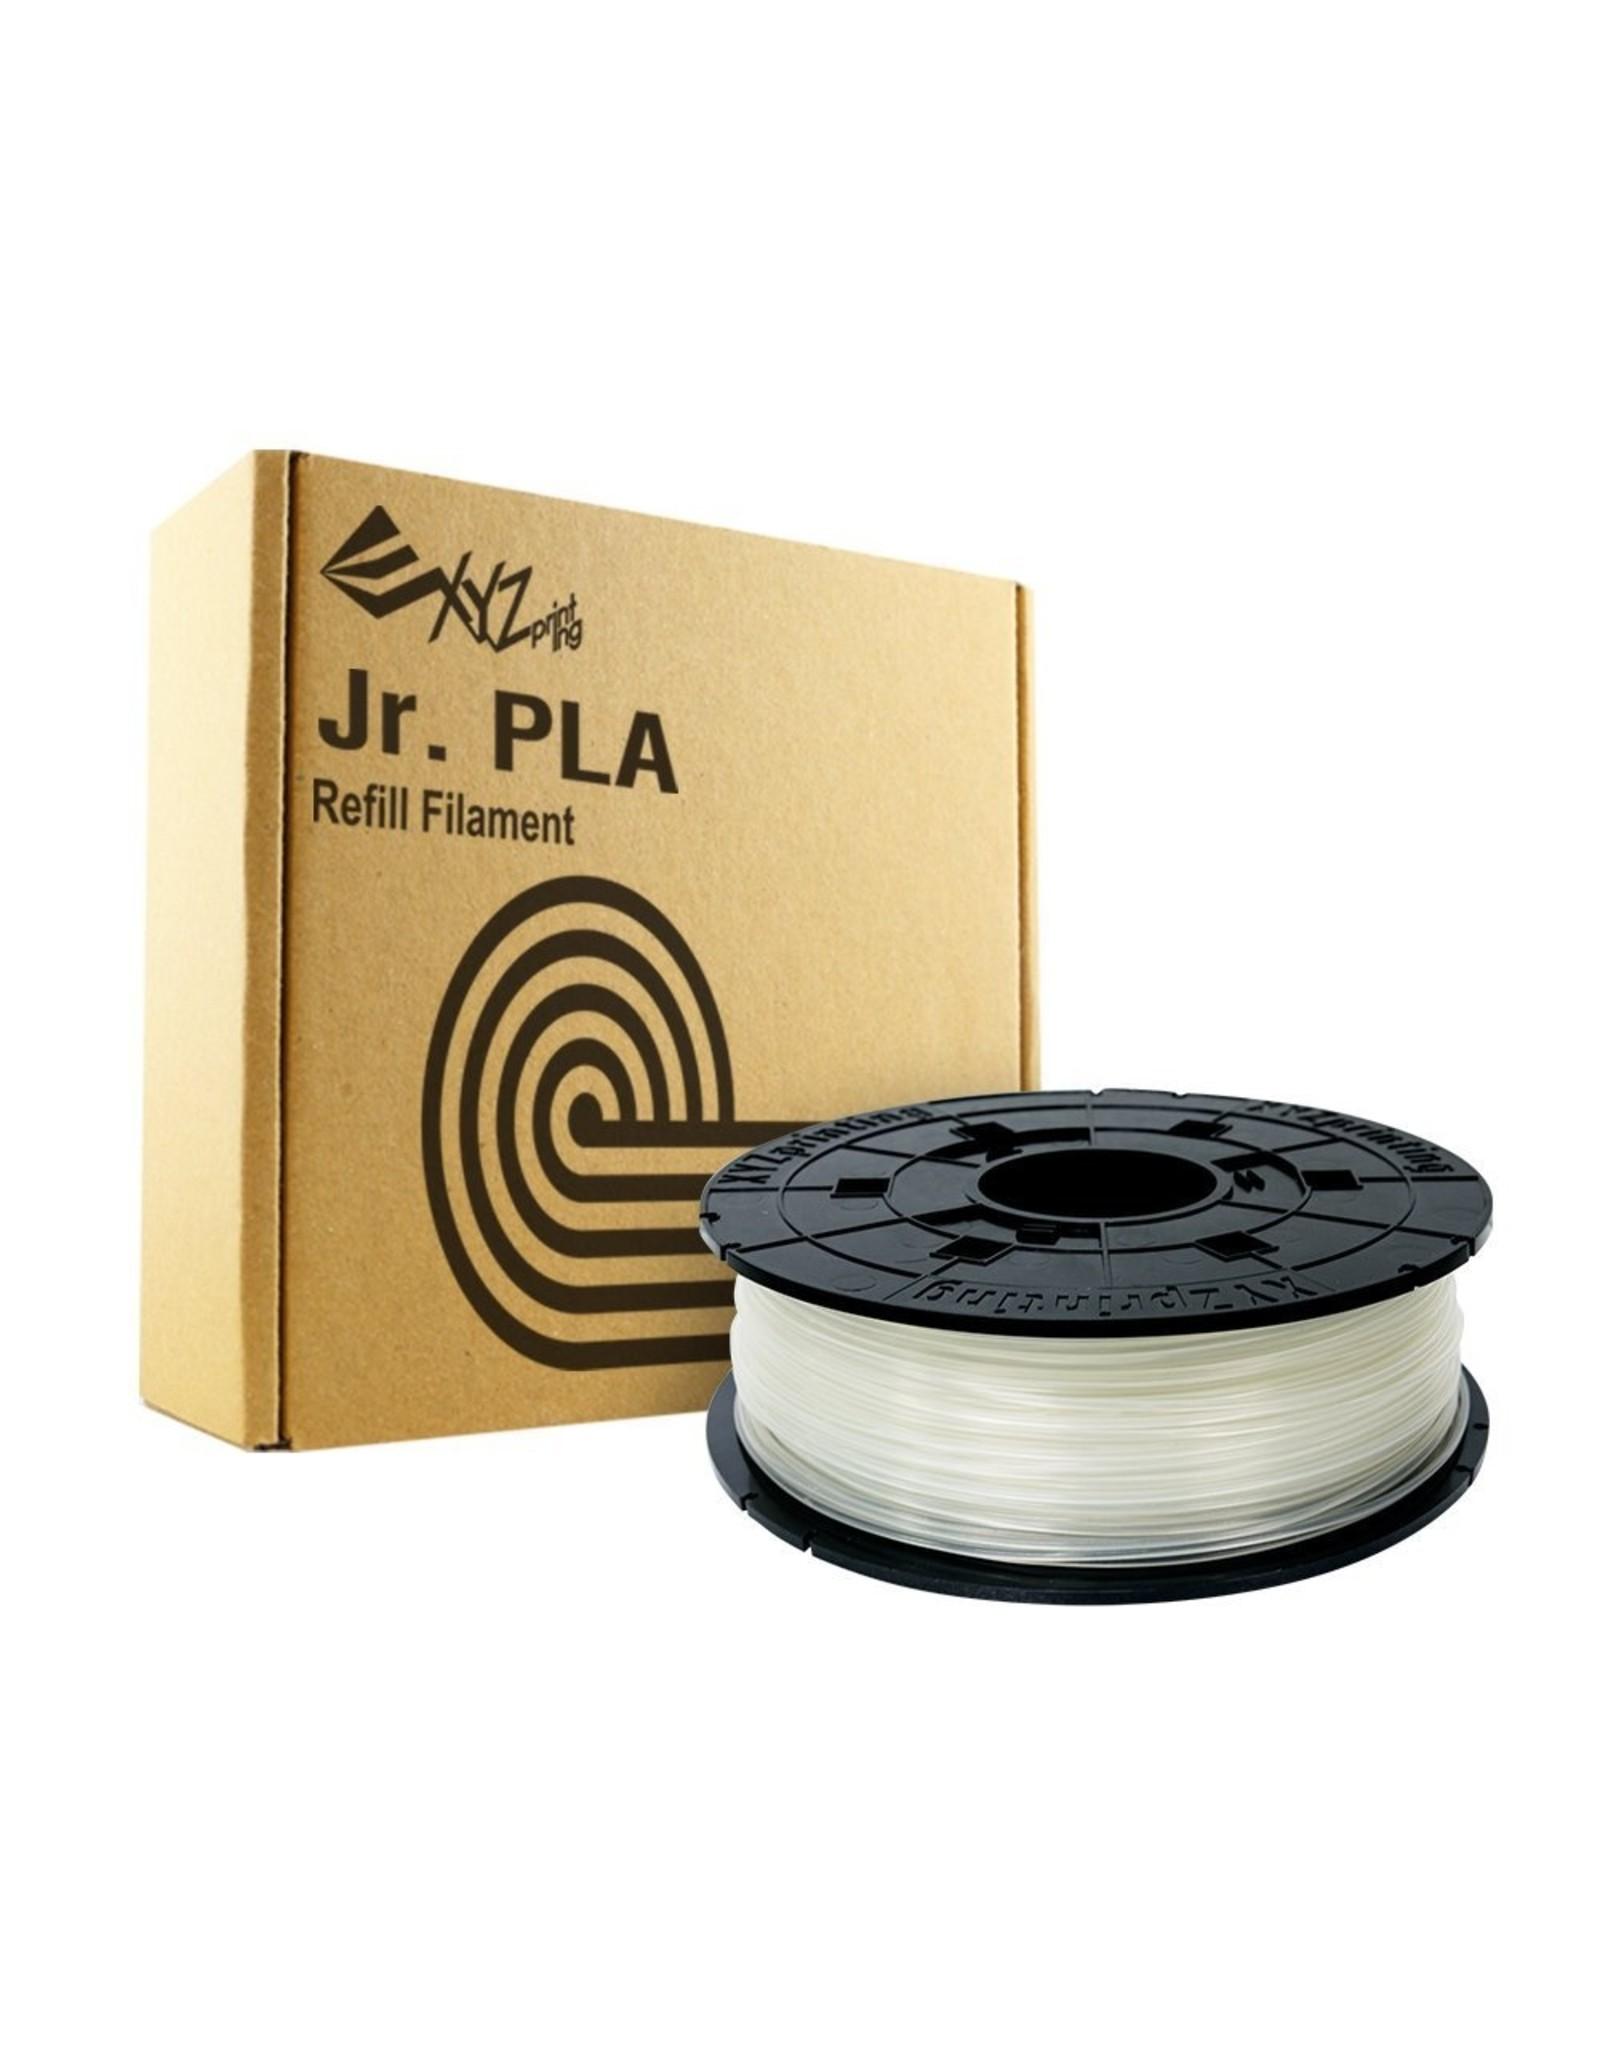 XYZ Printing Da Vinci XYZprinting Da Vinci Junior PLA - 600g - Pearl White